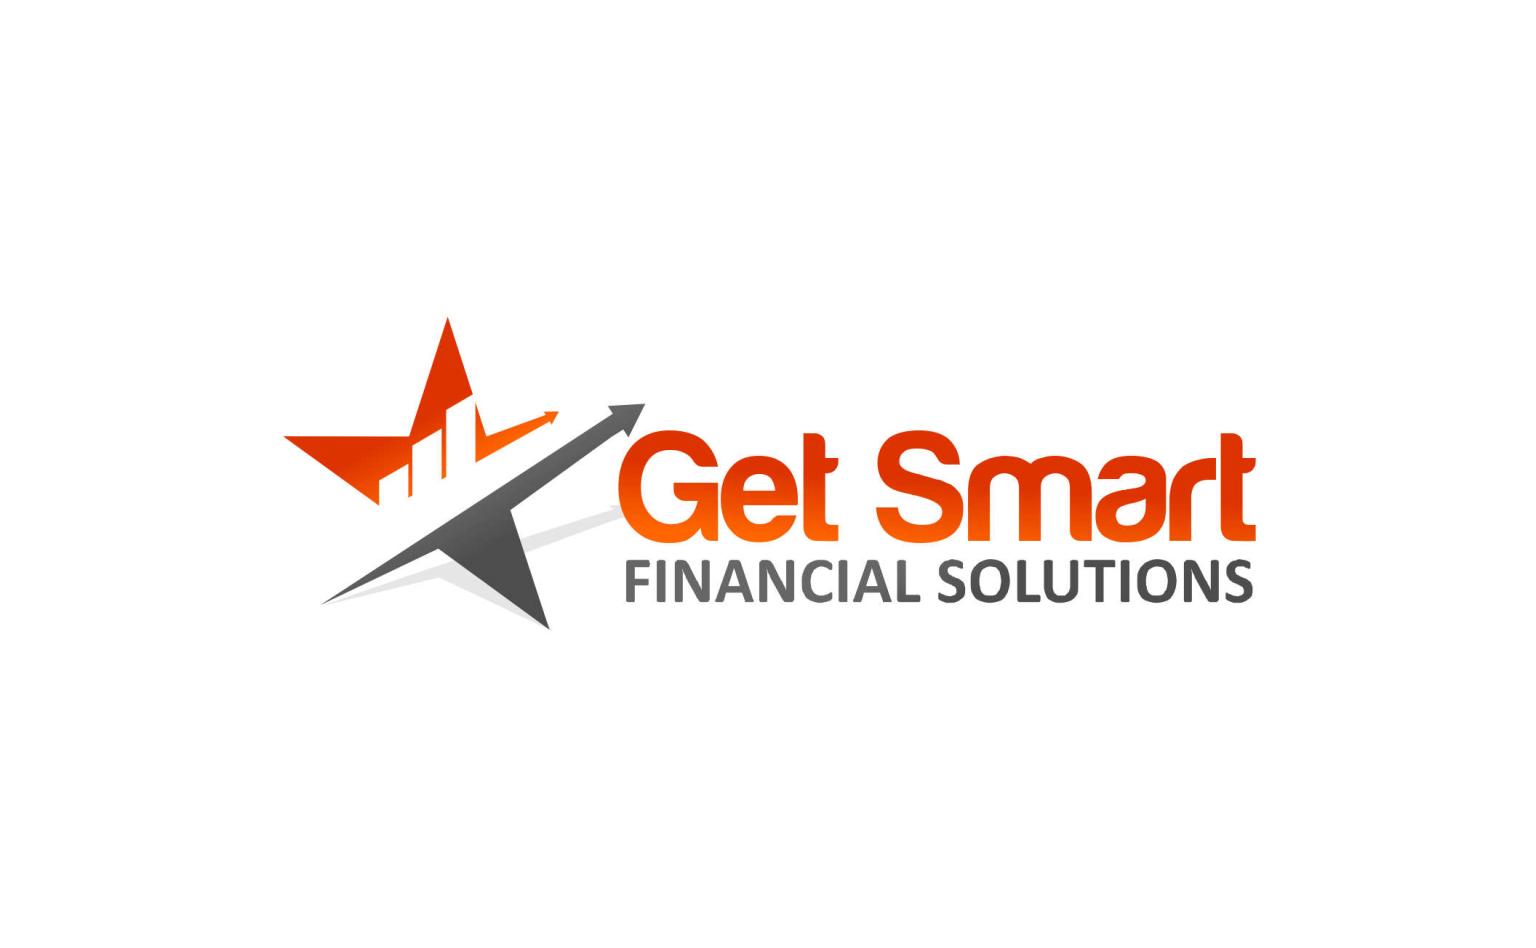 Get Smart Financial Solutions